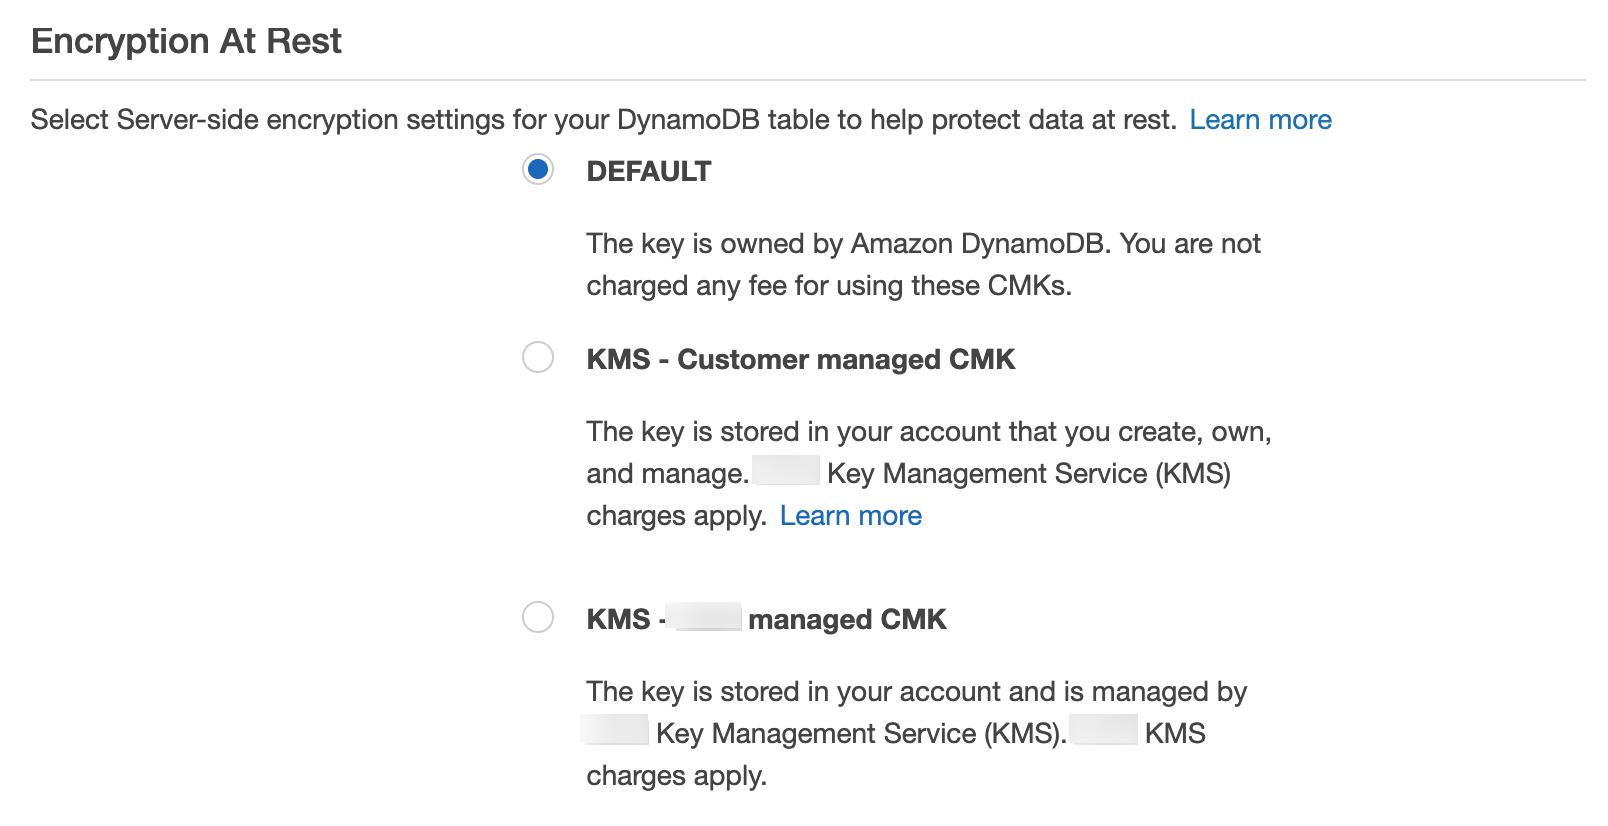 Managing Encrypted Tables - Amazon DynamoDB